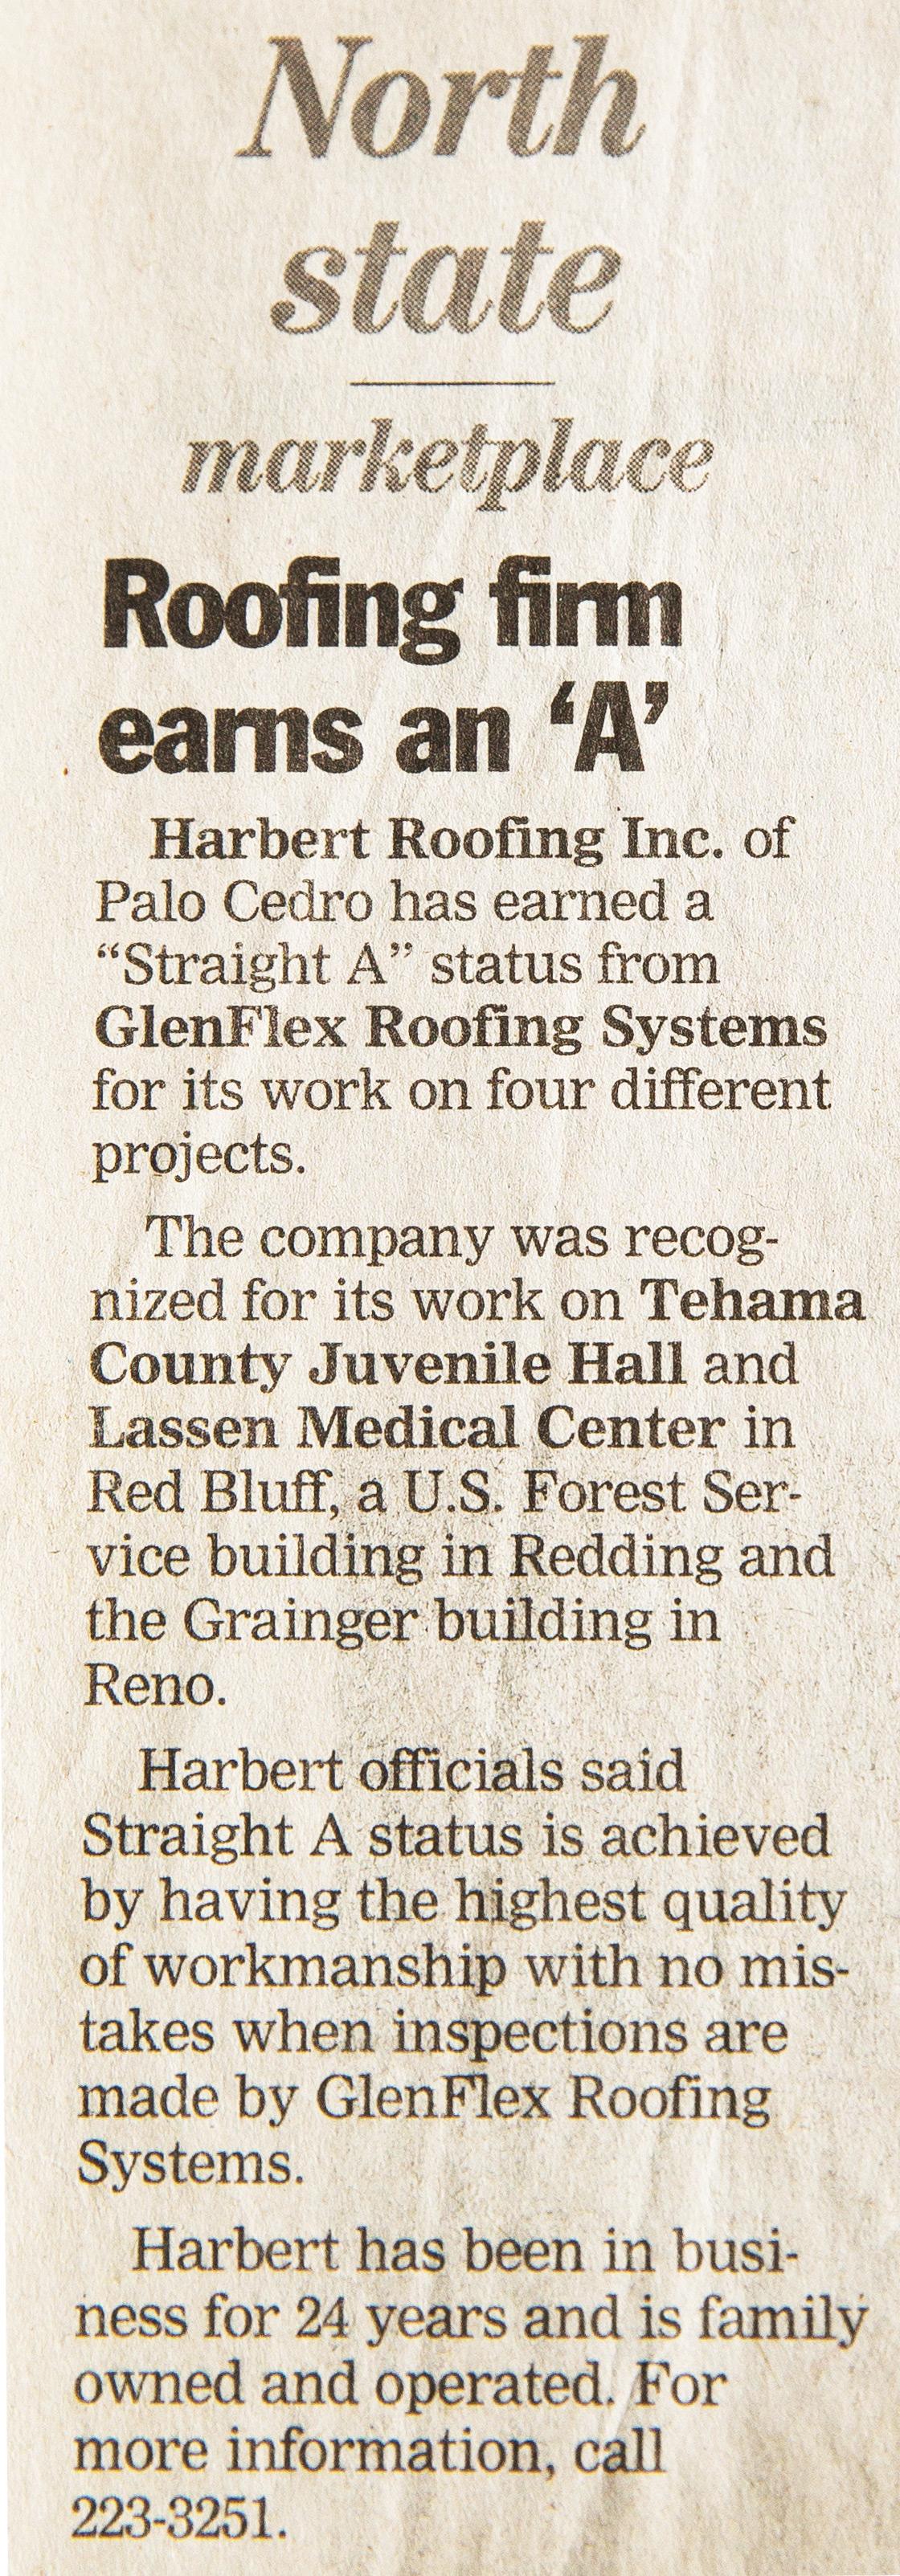 Harbert Roofing Inc. of Palo Cedro has earned a